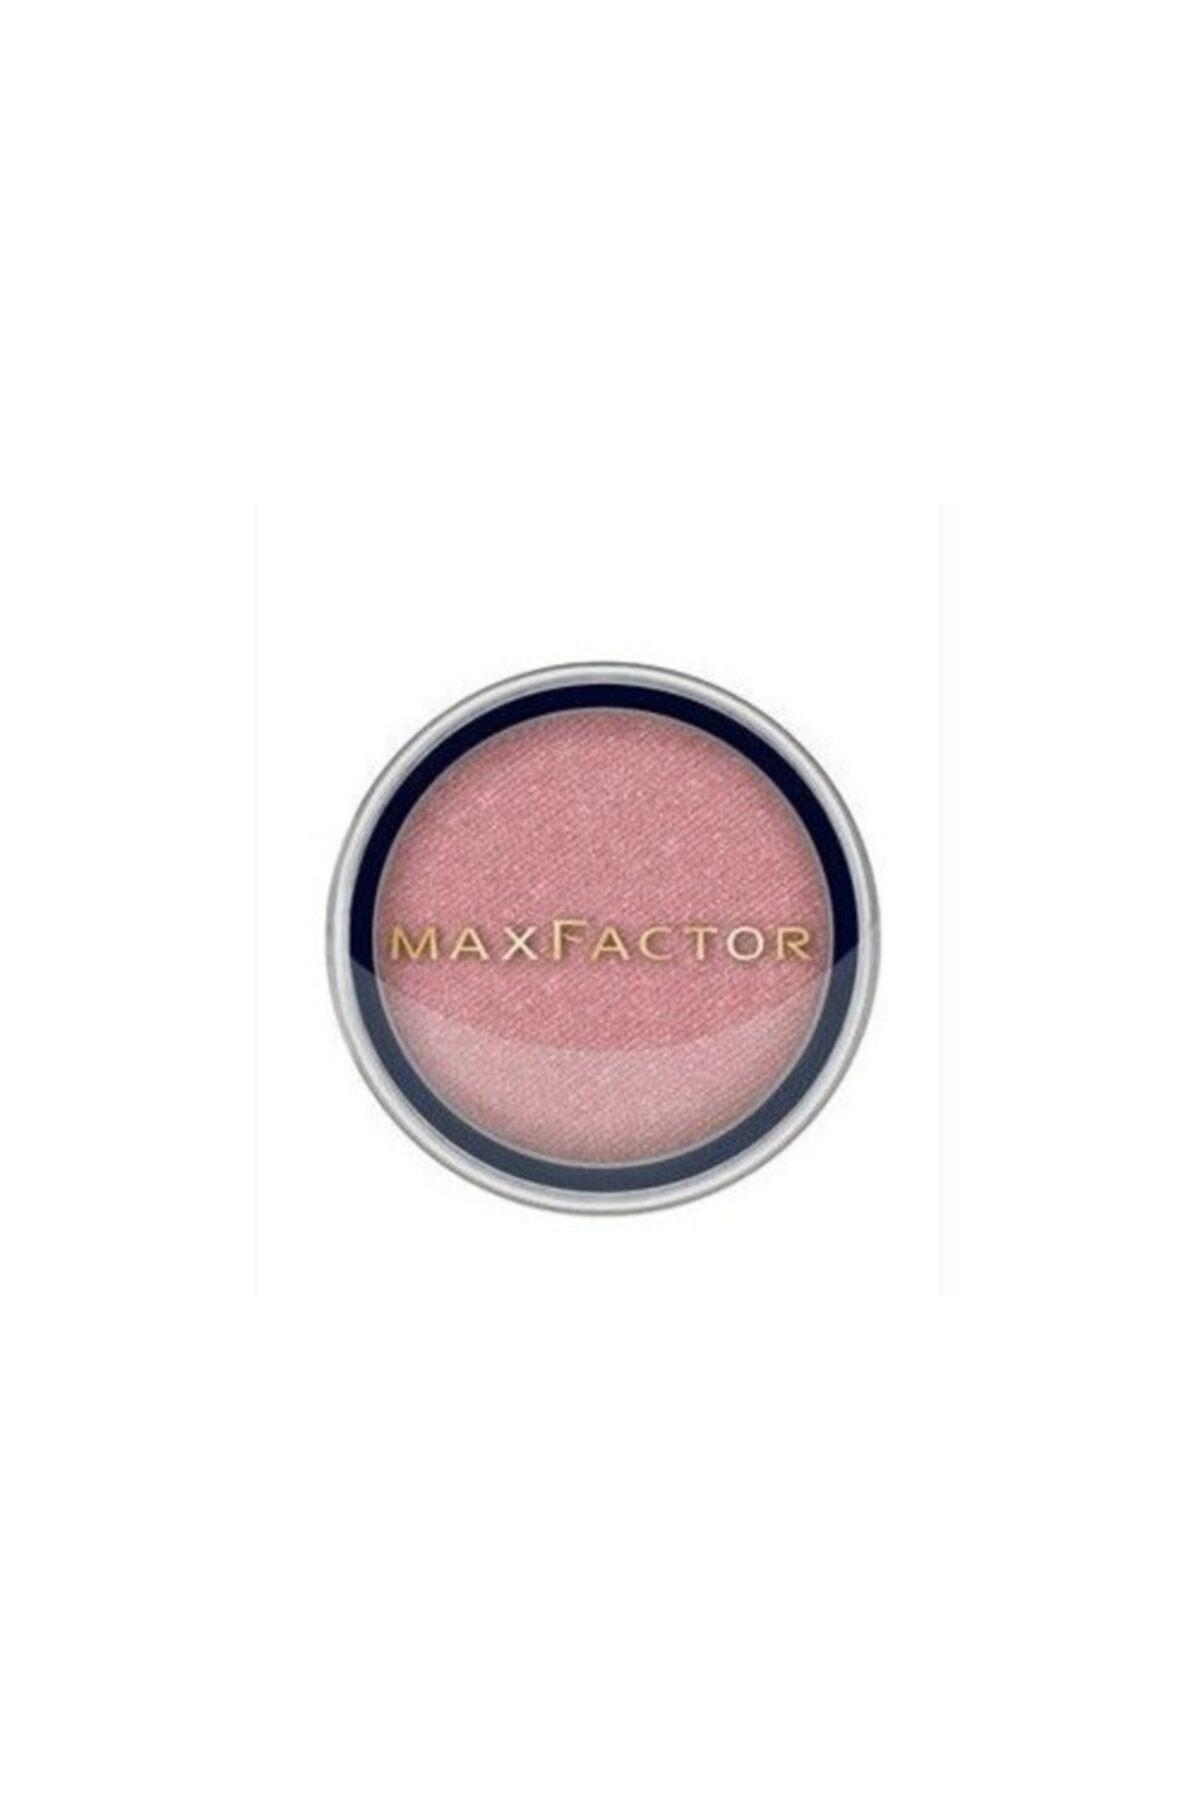 Max Factor Earth Tekli Far 114 50705559 1